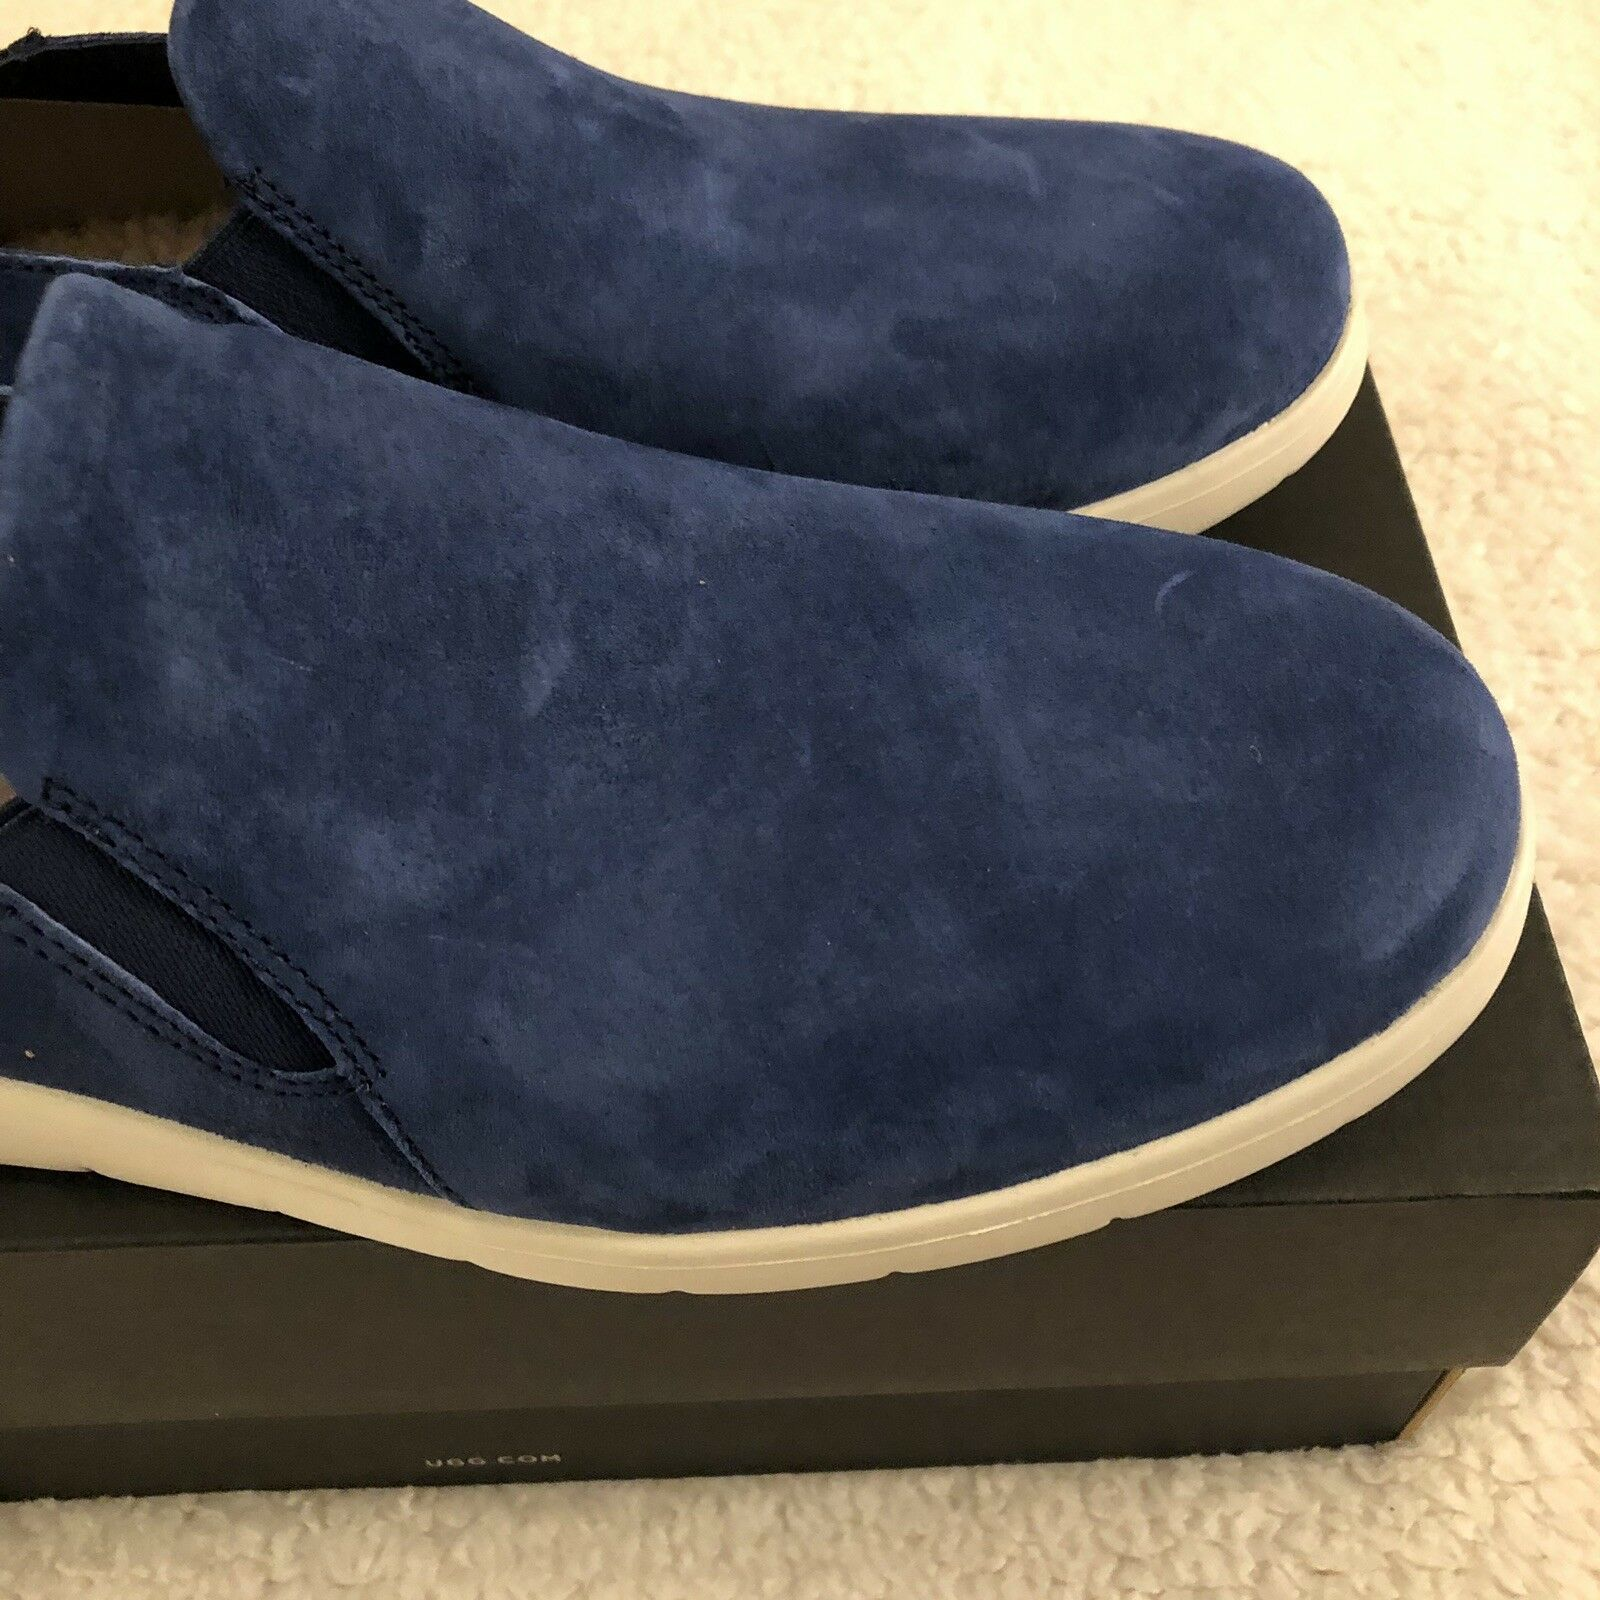 NEW UGG Men's Knox Suede Slip On Sneaker, Sizes 9, 11  Blue, MSRP $100 image 10